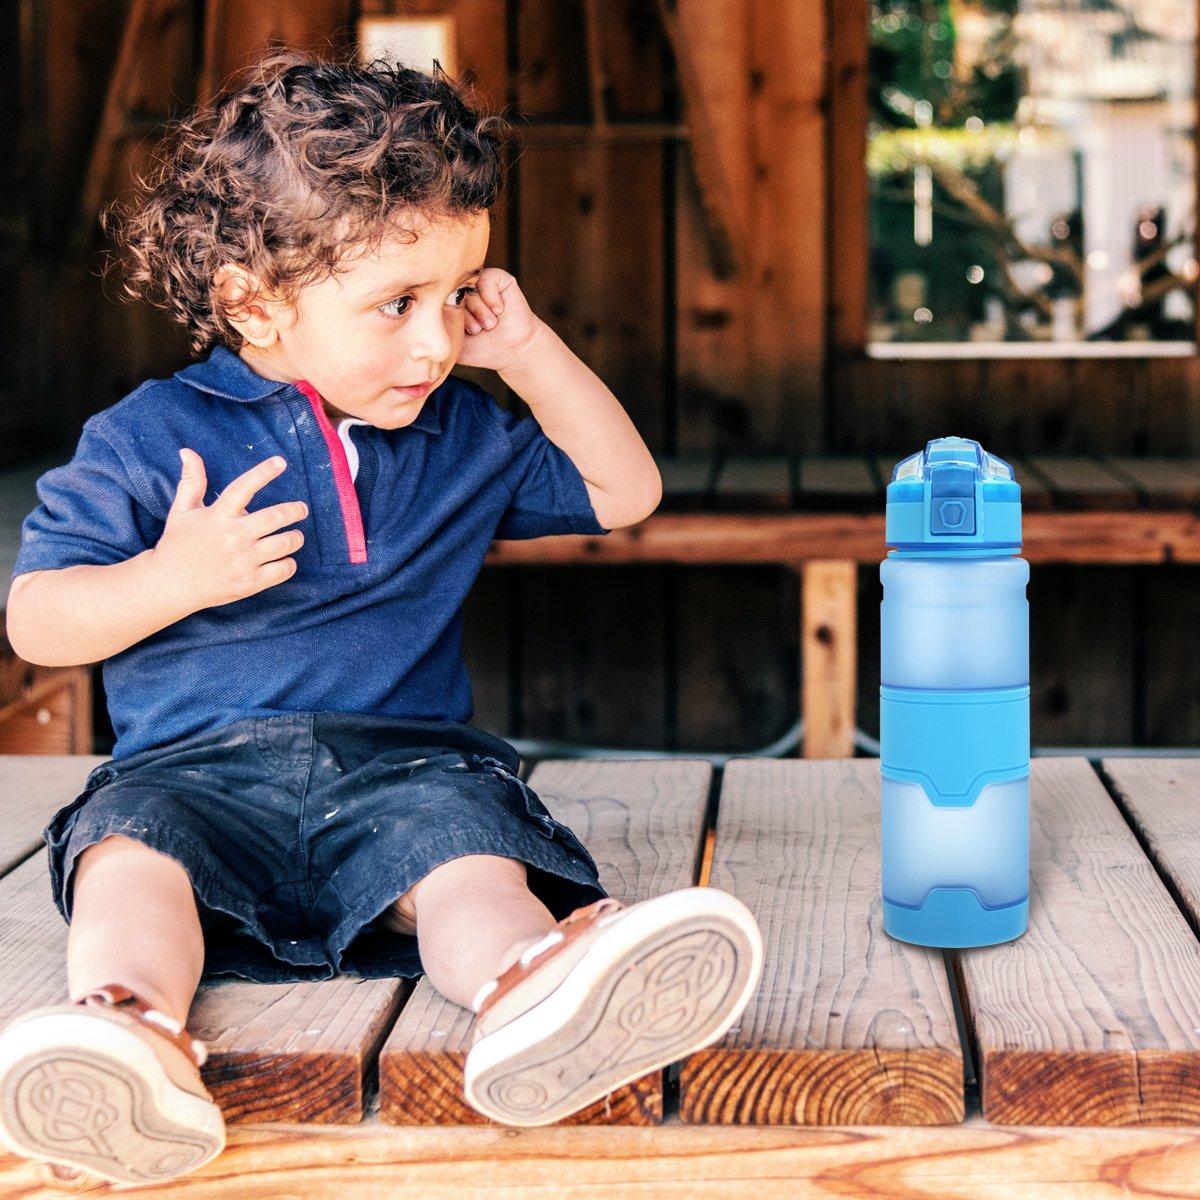 Botella de Agua,CAMTOA 500 ML Botella Agua,Nuevo Dise/ño/&Reutilizable Botella Deporte,Material Libre de BPA/&Leak-Proof Lid,Perfecto para Usar en Carreras,Gimnasia,Yoga,Camping,Bicicleta,Al Aire Libre.